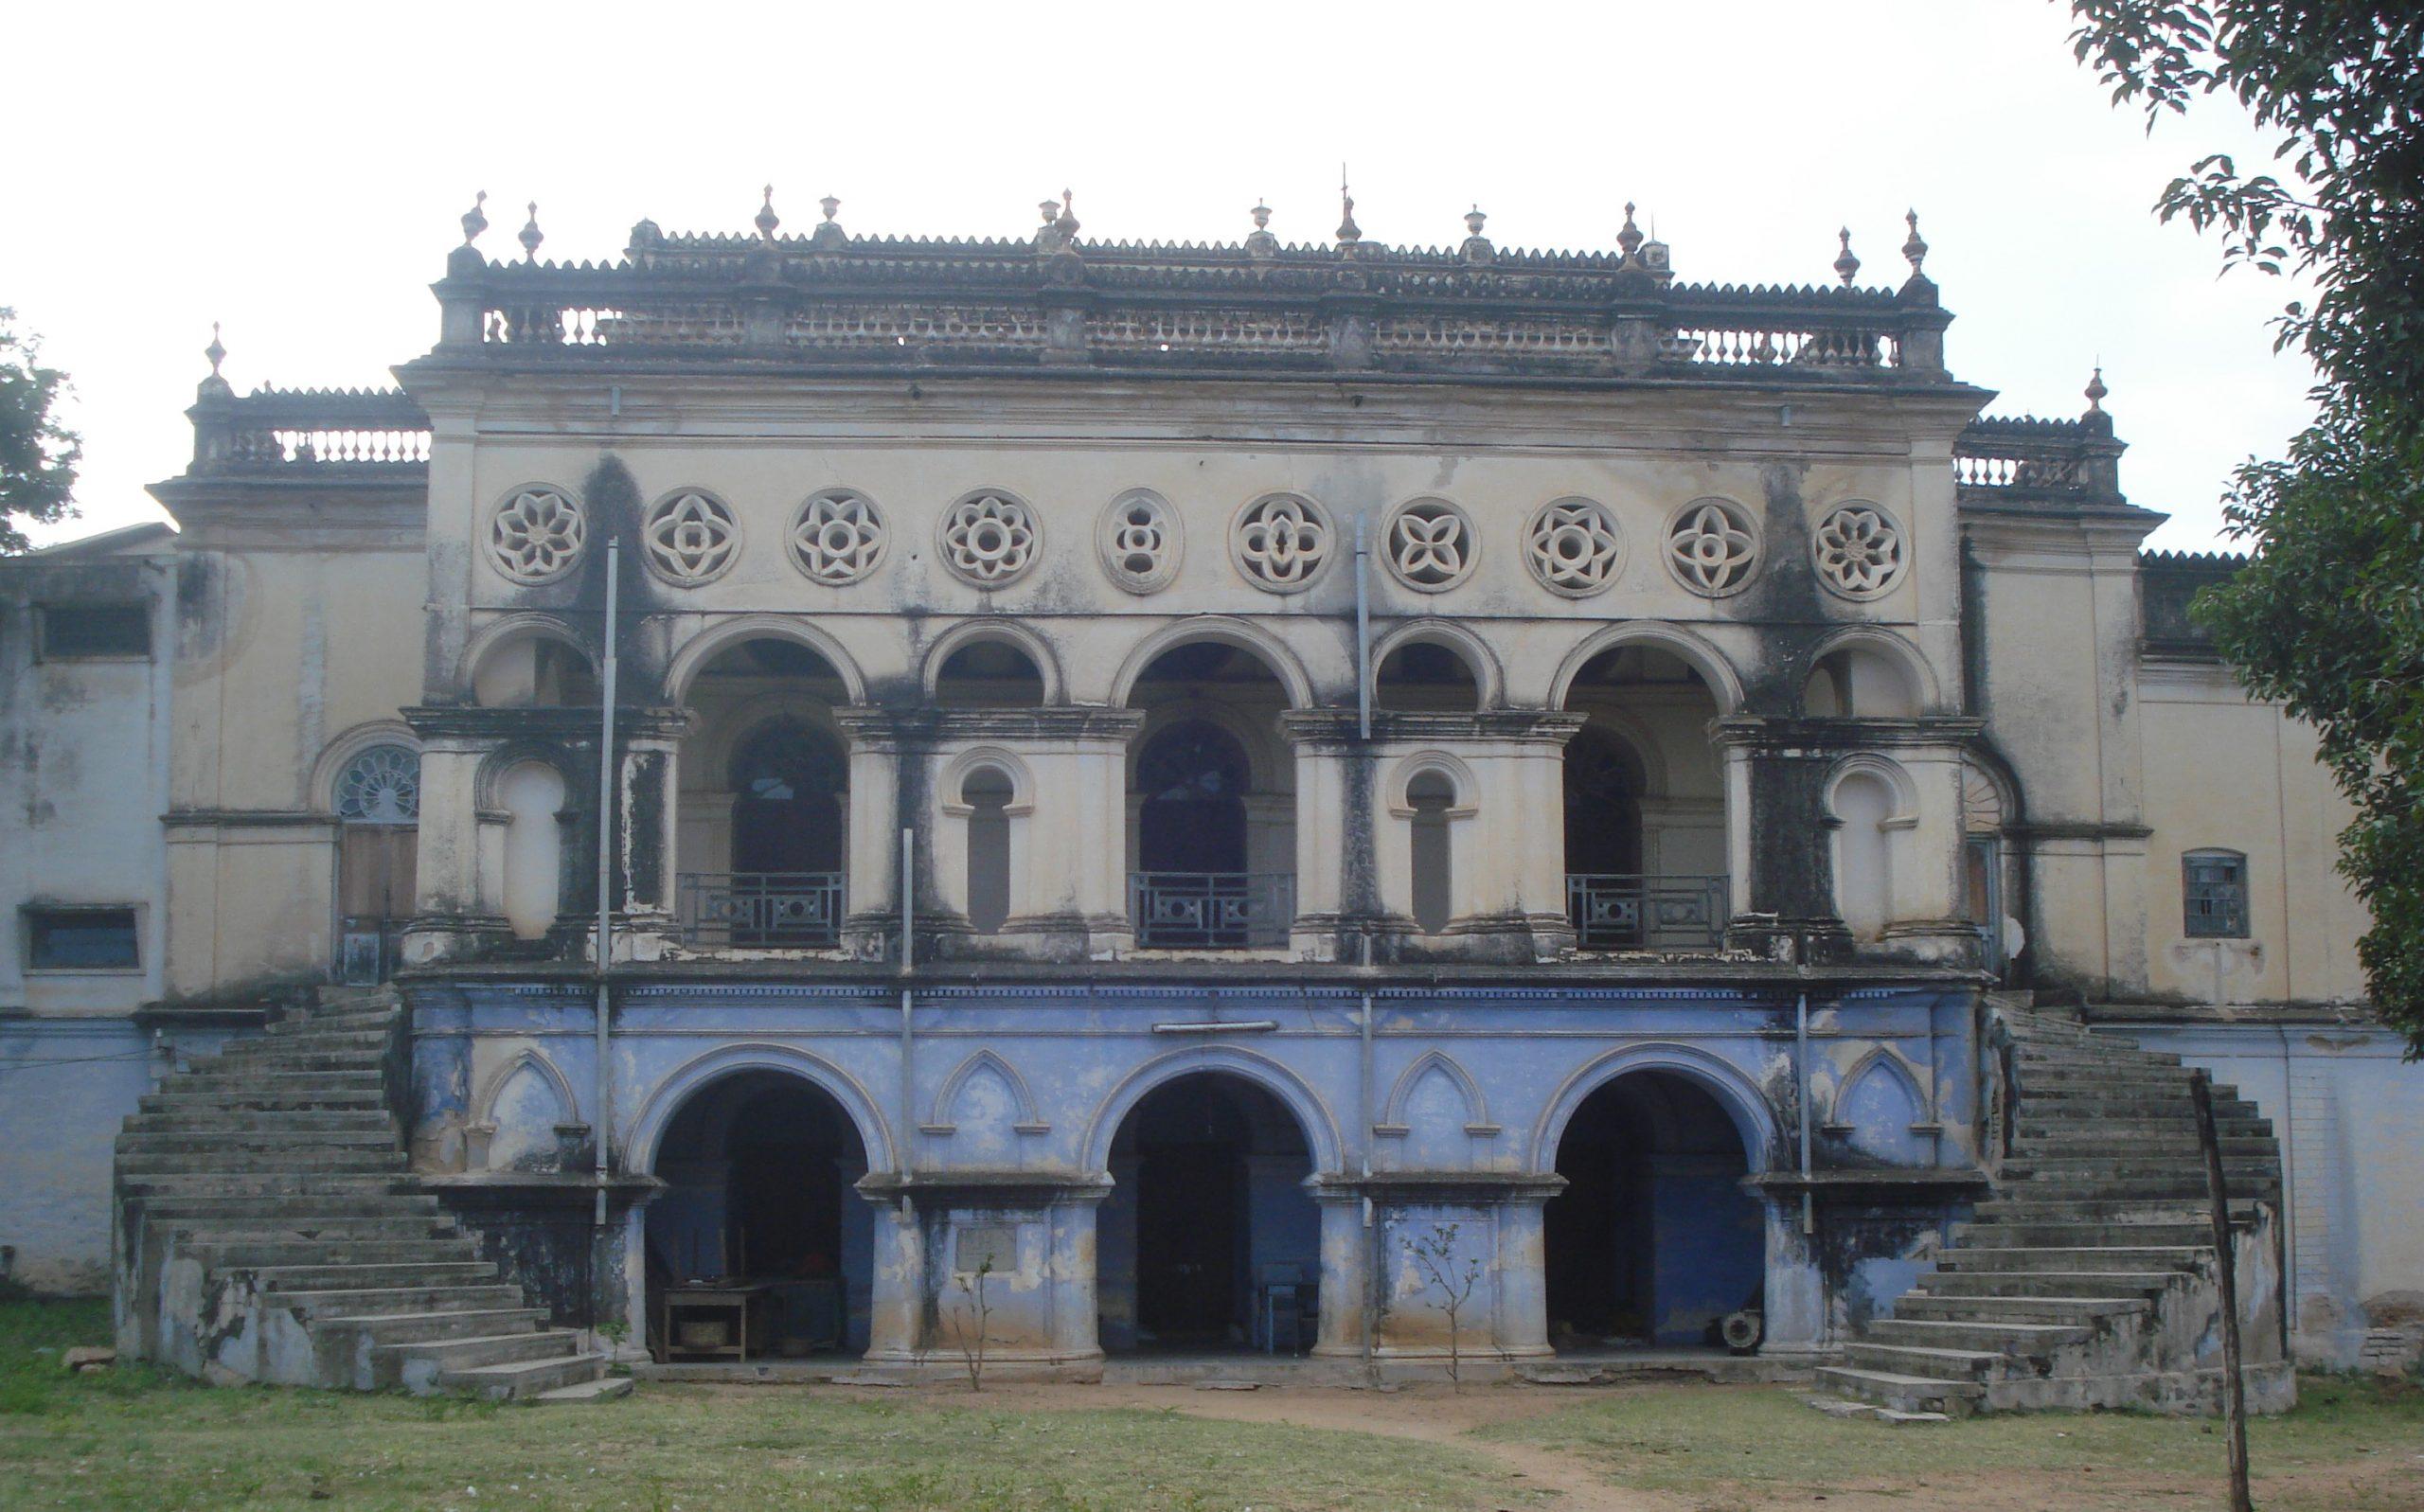 Kollapur